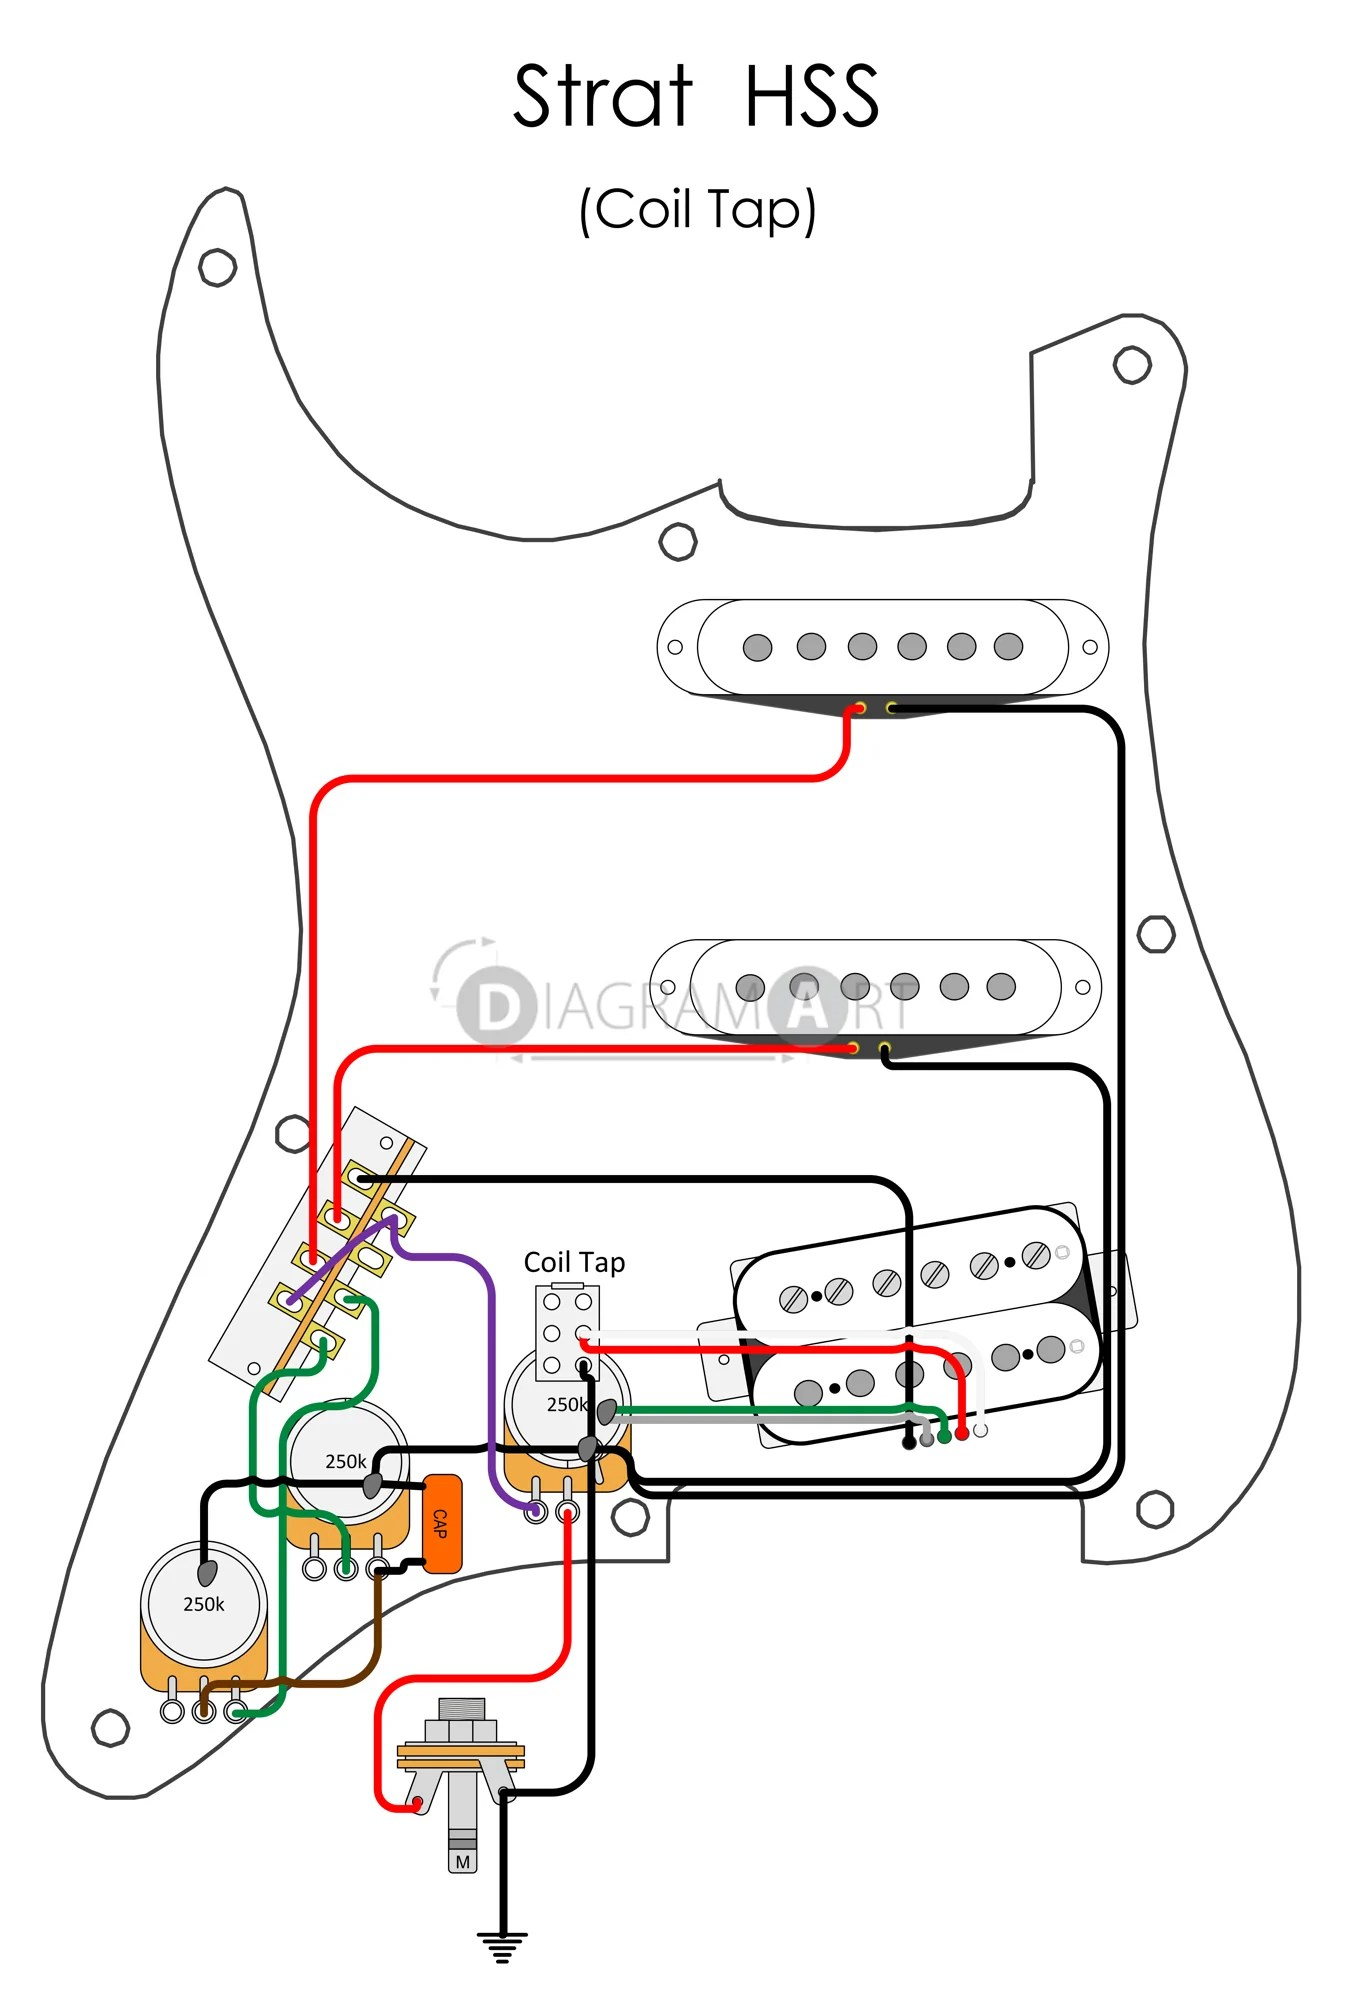 hss with coil split wiring diagram wiring diagram schematics strat wiring diagram coil tap hss coil [ 1348 x 2000 Pixel ]